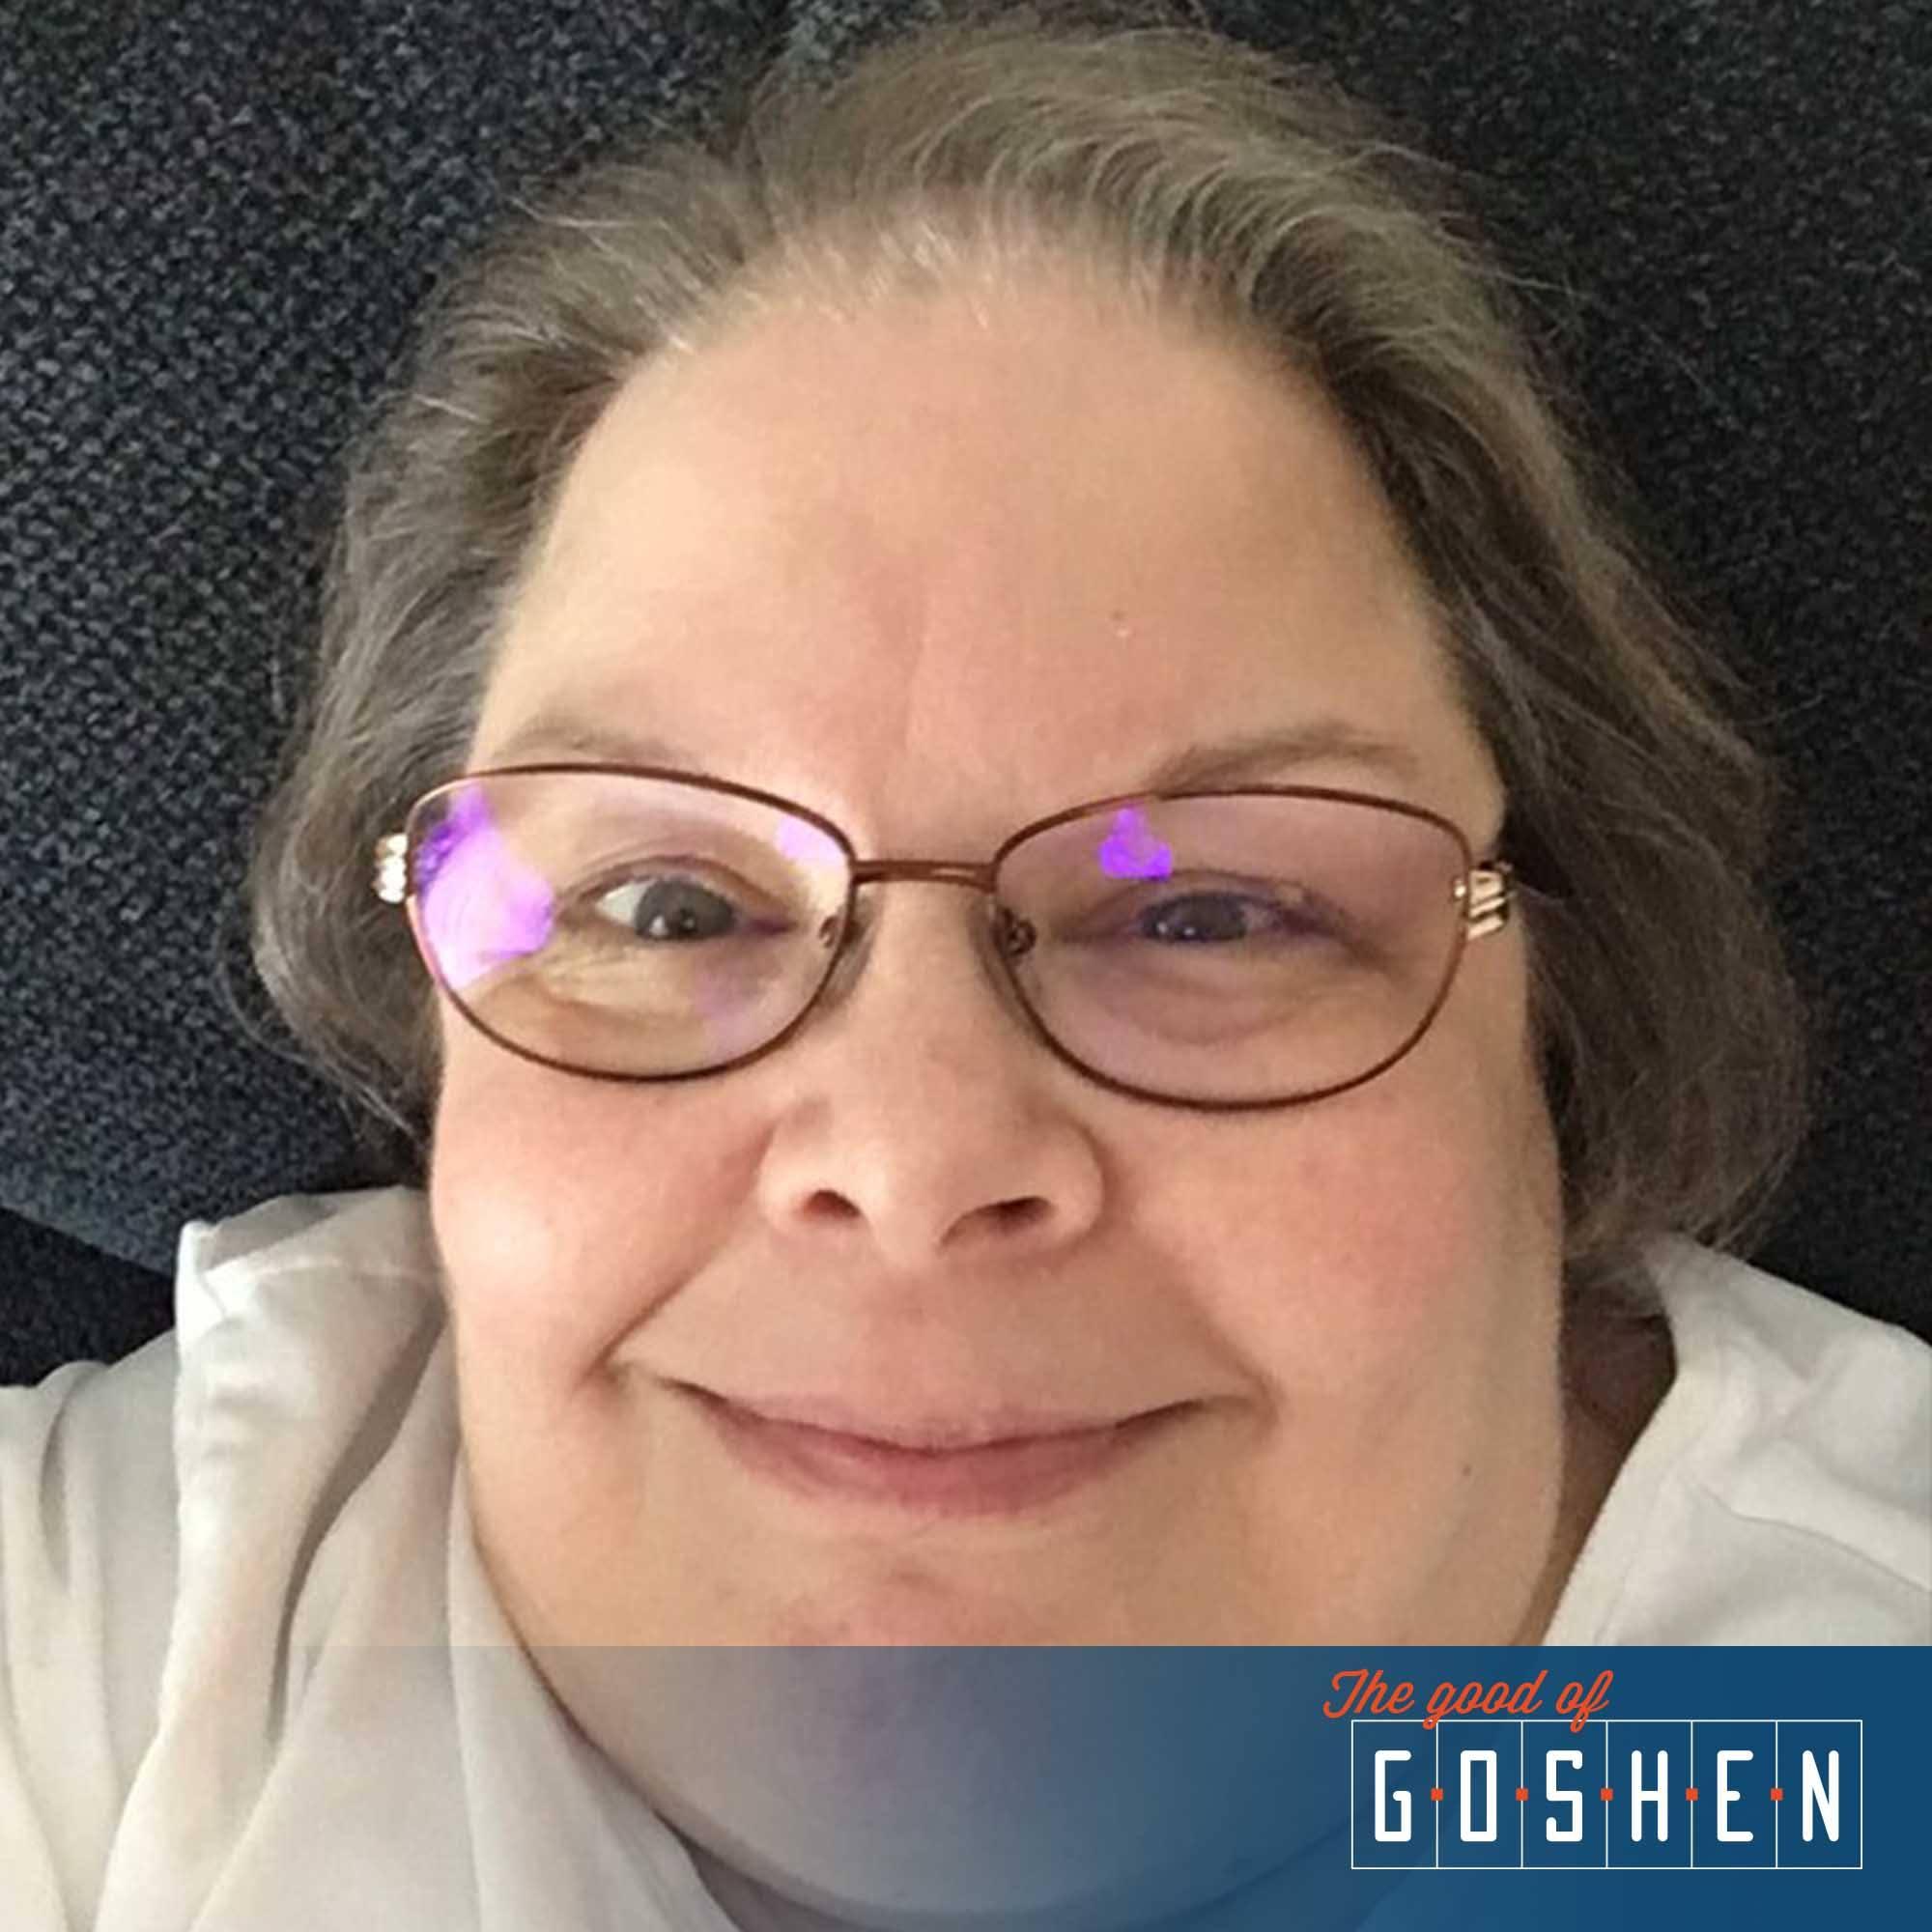 Karen Grubb • The Good of Goshen